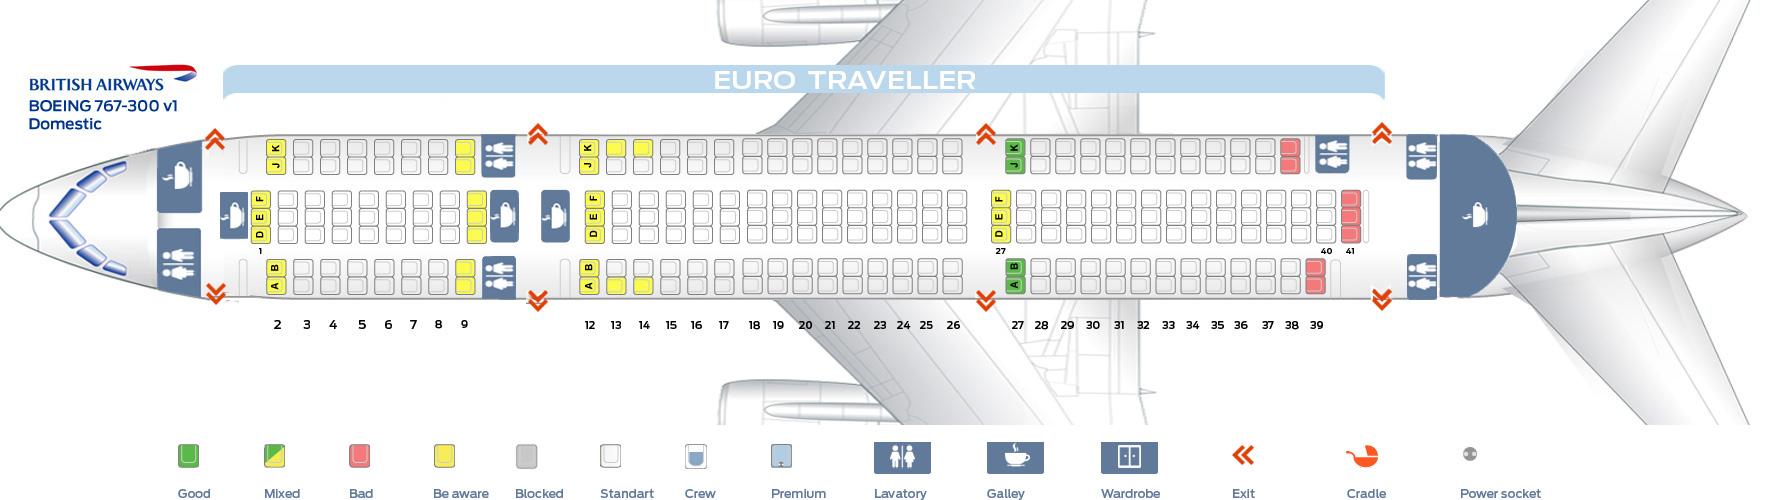 Seat_map_British_Airways_Boeing-767_300_v1_Domestic